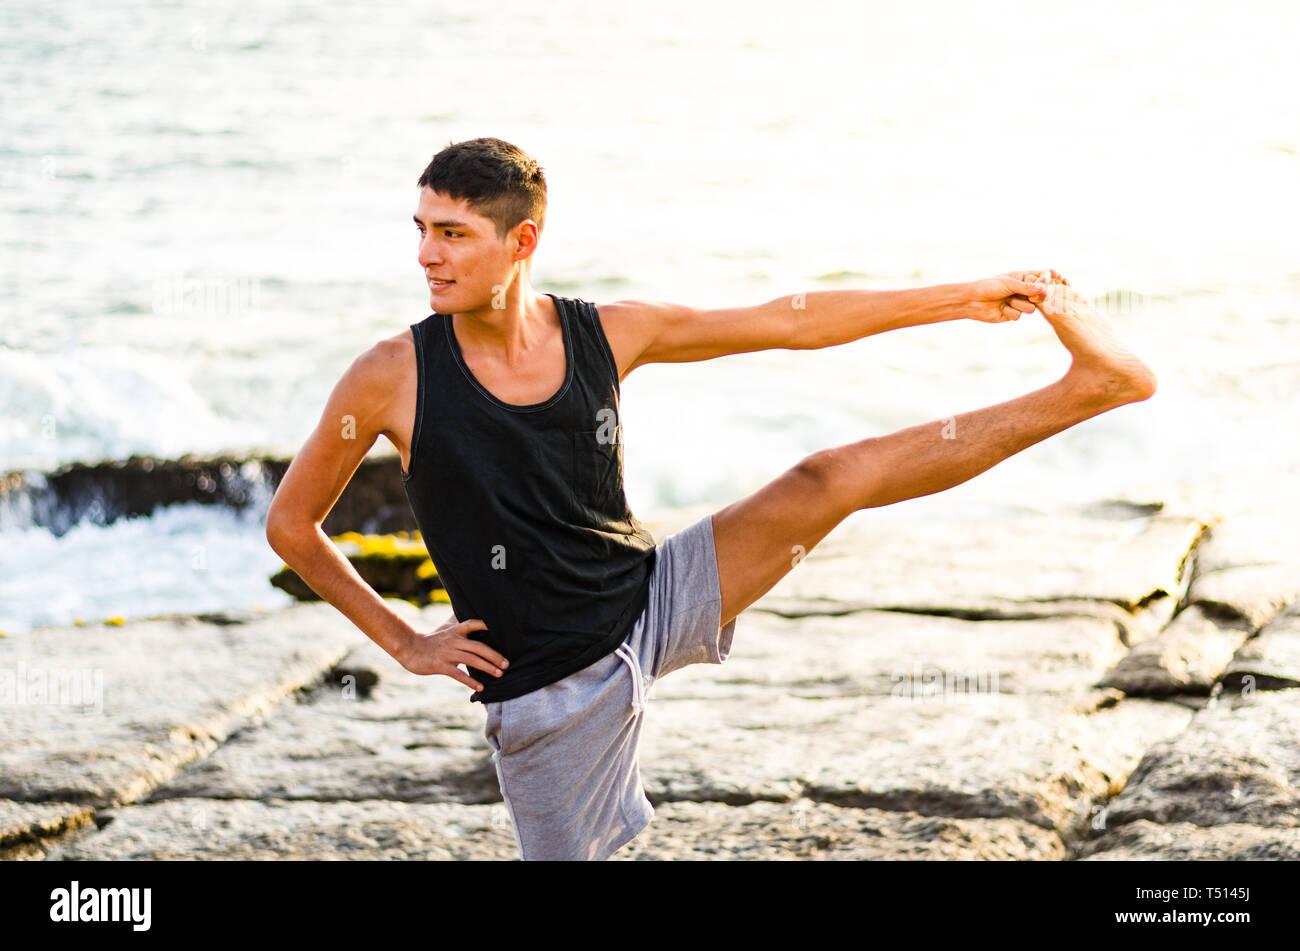 Young man practicing yoga, doing Parivrtta Utthita Hasta Padangusthasana exercise, Twisting Extended Hand to Big Toe pose, working out, yoga - Stock Image